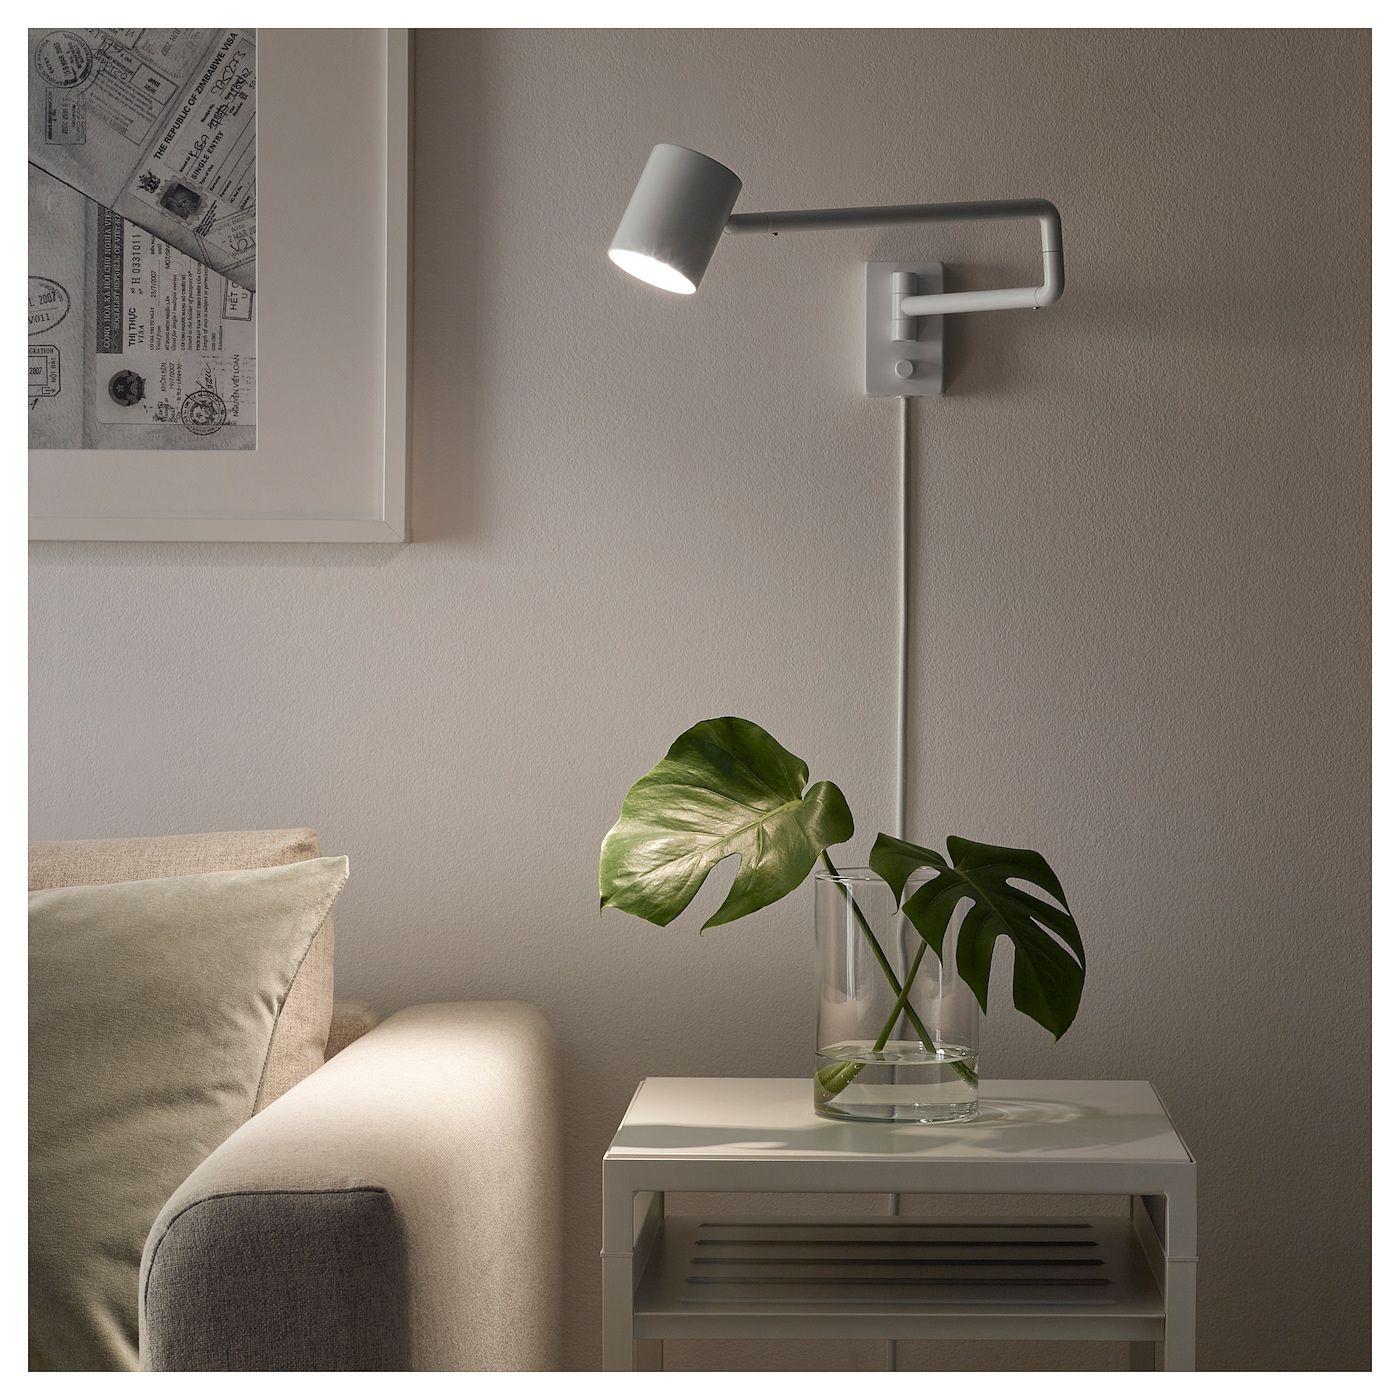 NymÅne Wall Lamp With Swing Arm Led Bulb White Ikea Vägglampa Nymåne Väggbelysning